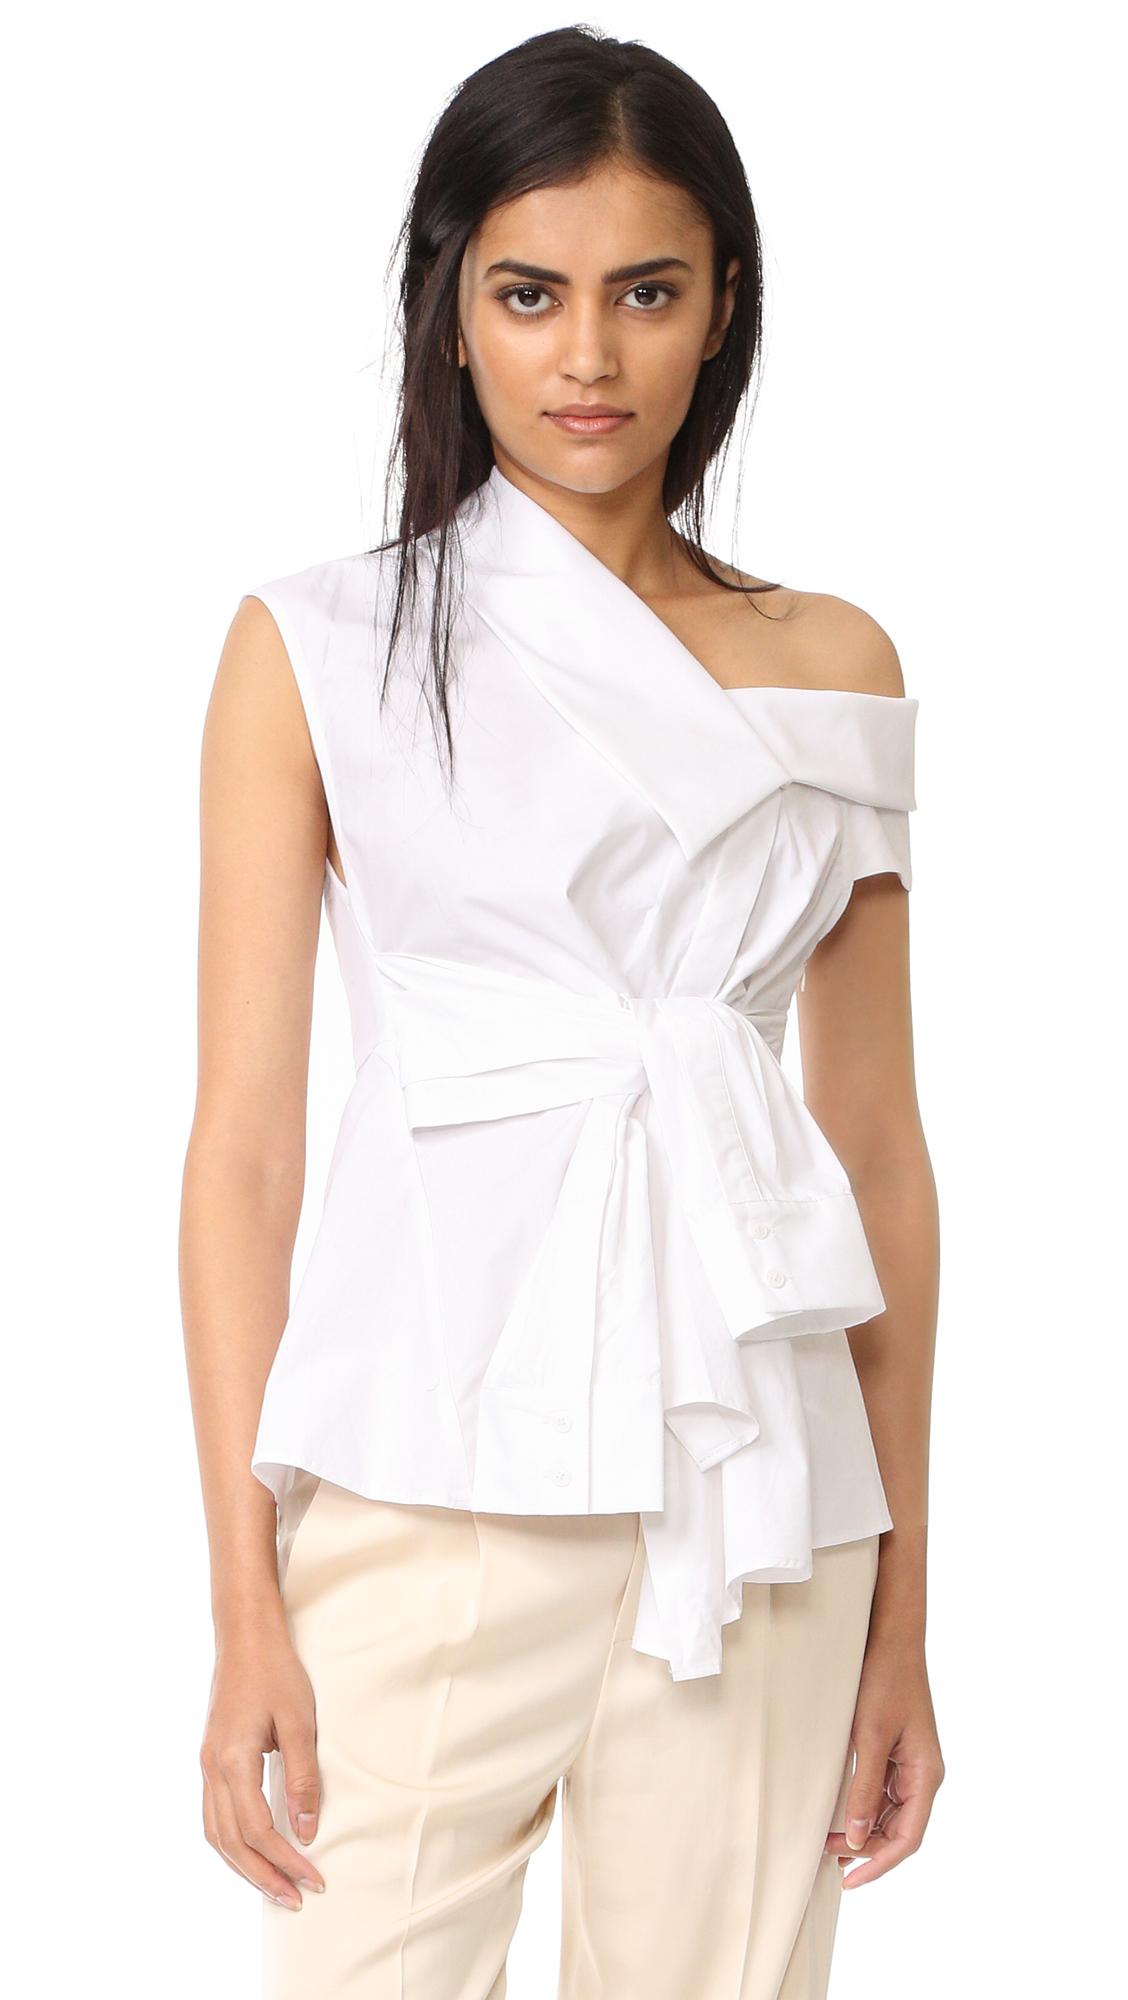 Acler Waldorf Shirt - White at Shopbop